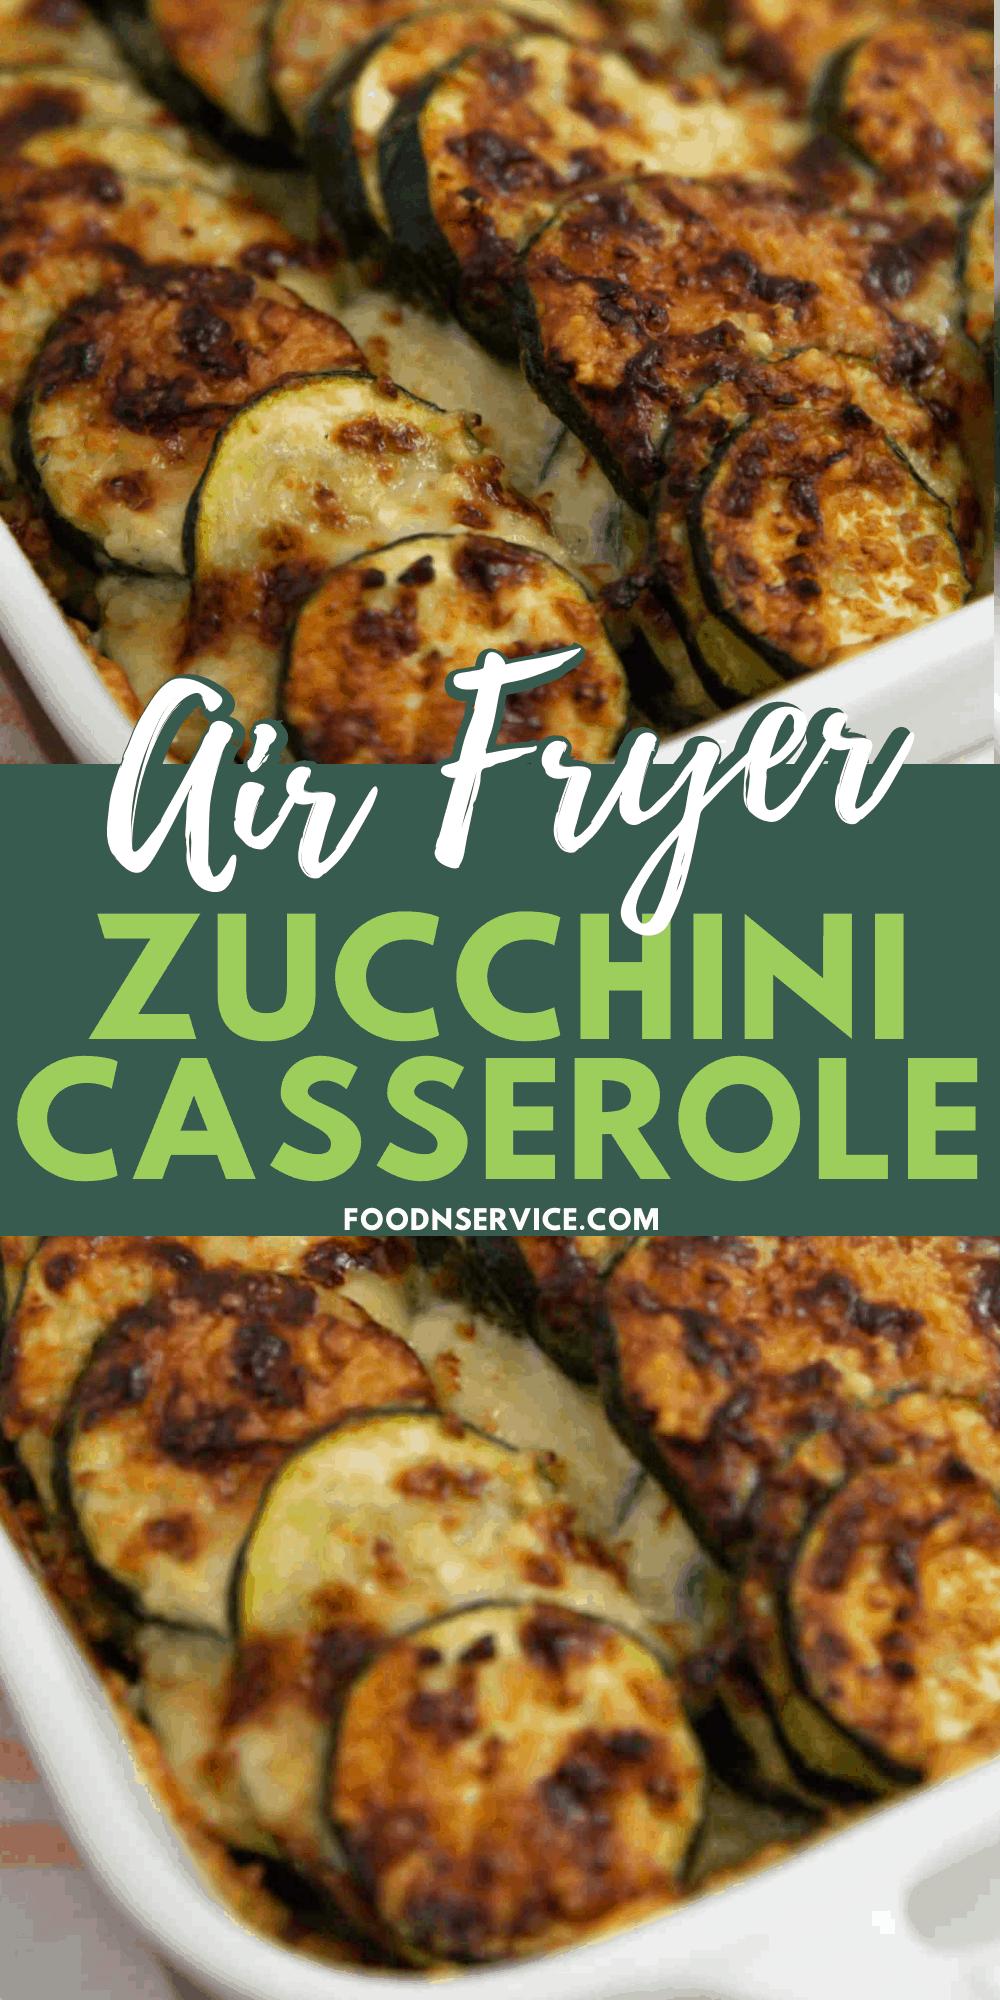 Air Fryer Zucchini Casserole